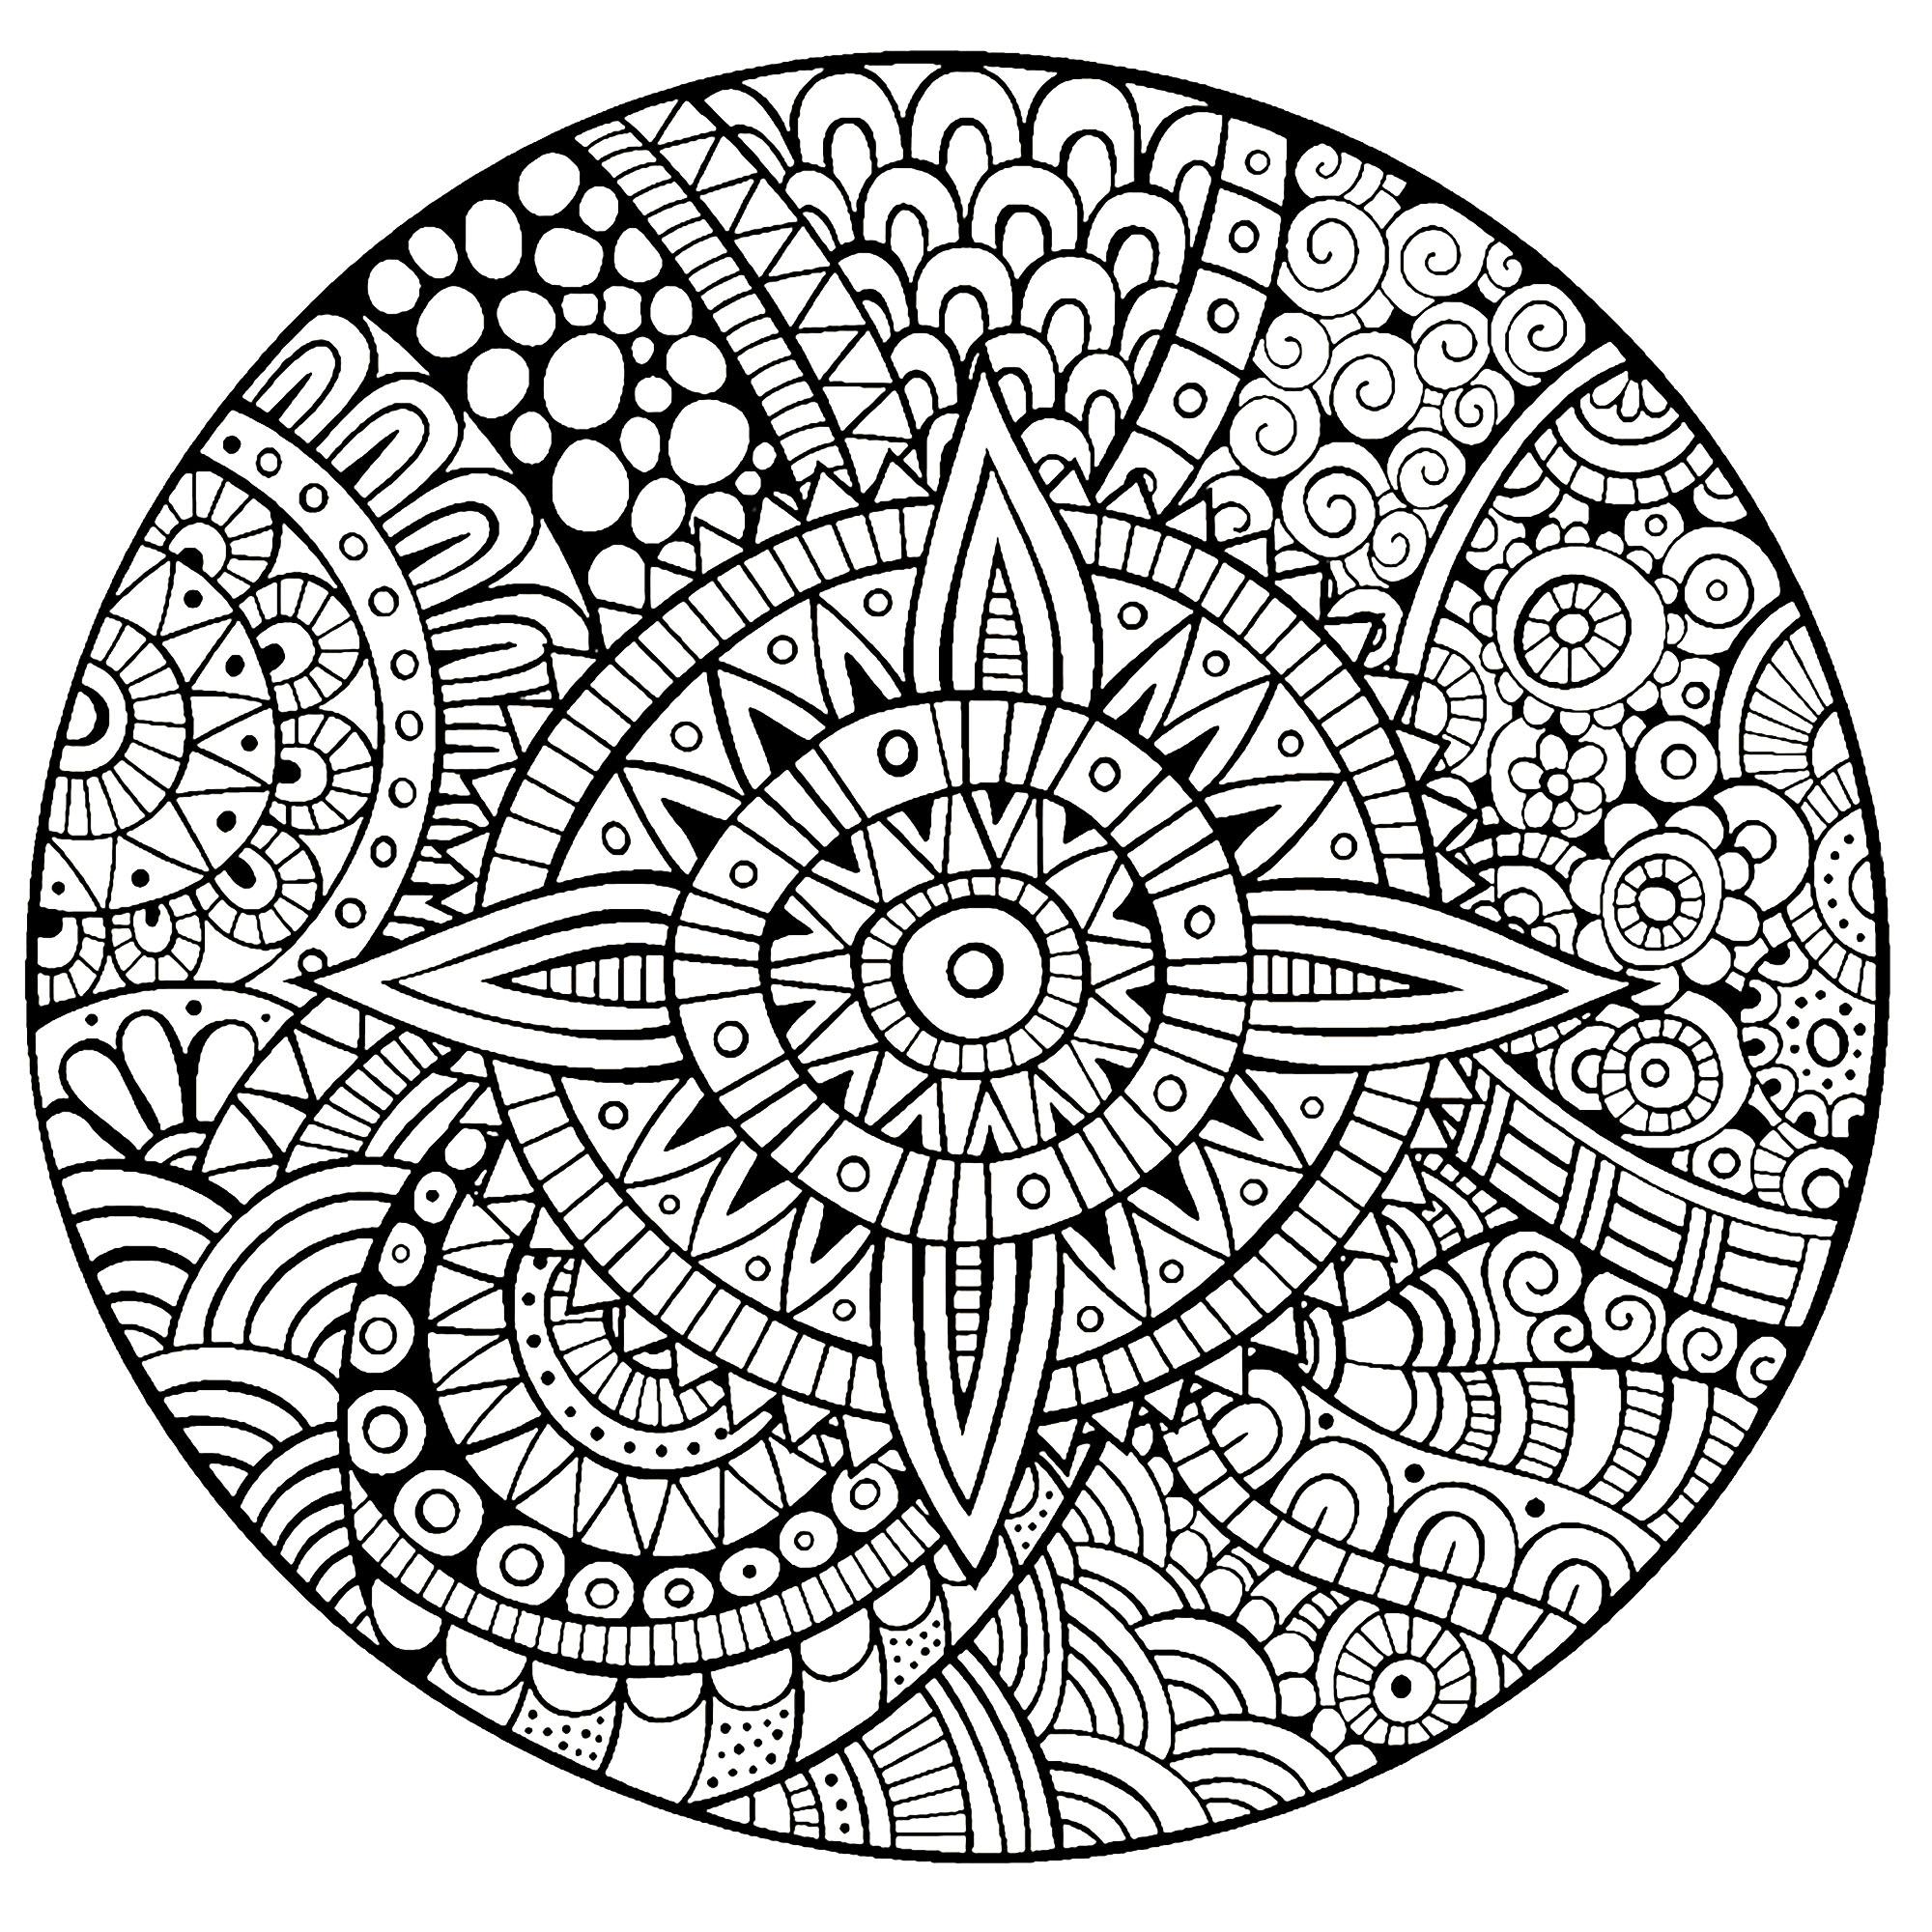 Mandala Abstrait Fleuri Mandalas Zen Anti Stress 100 Mandalas Zen Anti Stress